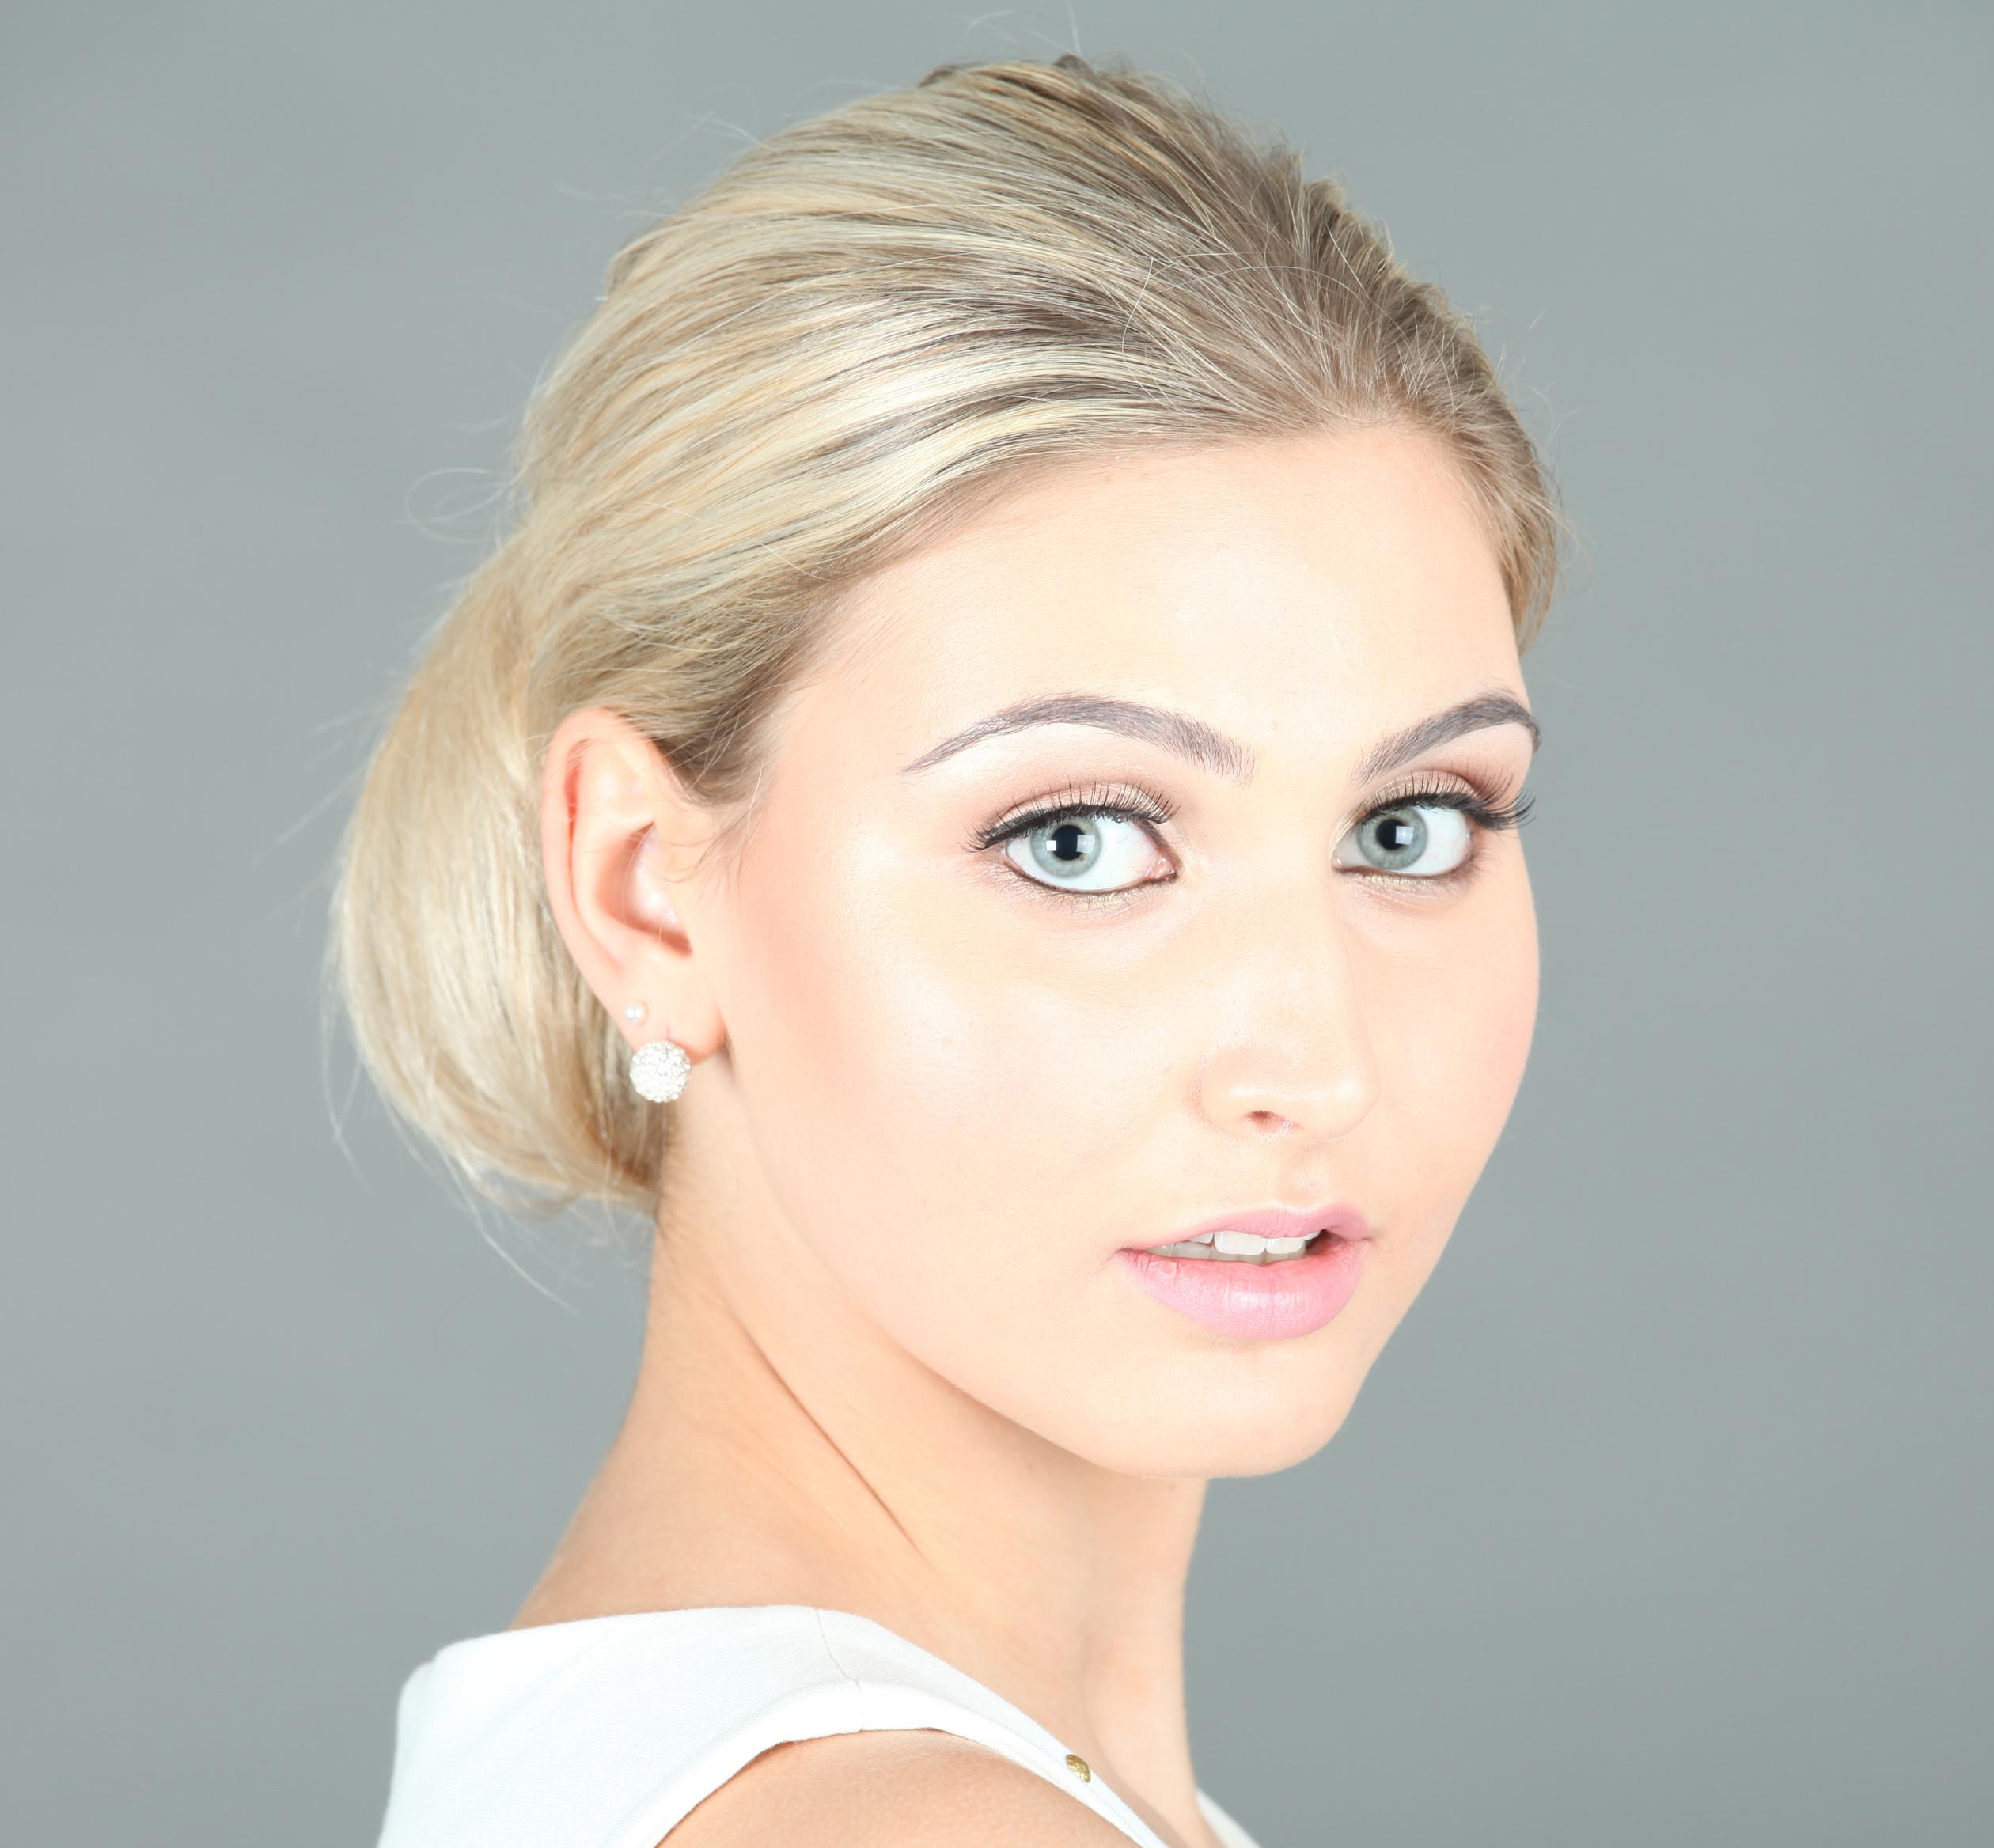 Makeup Artist university sydney law